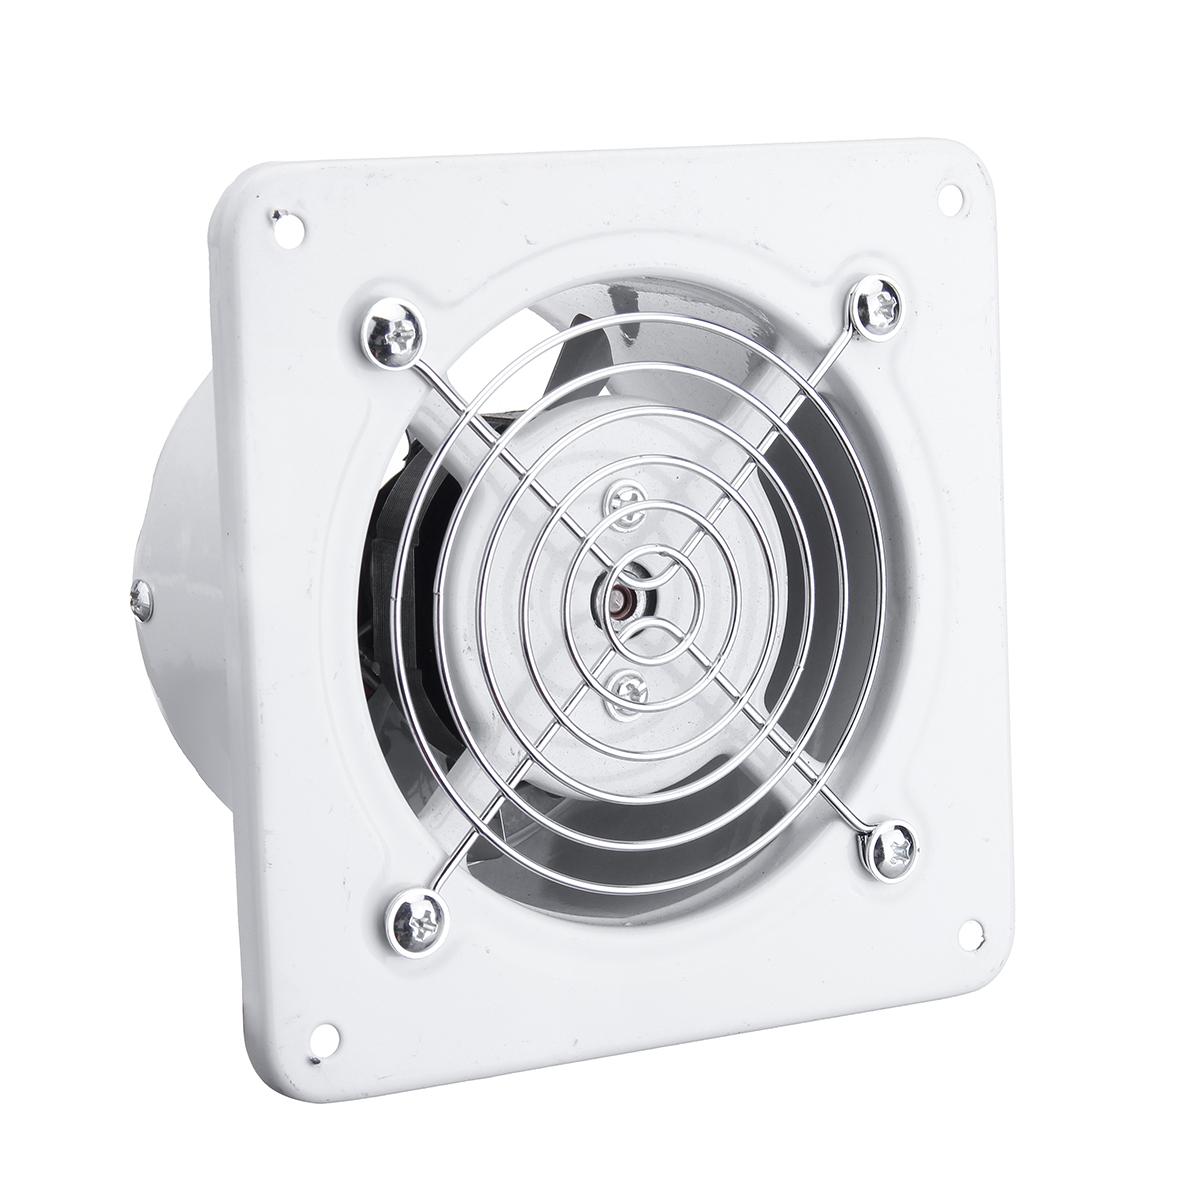 Other Hand Tools 4 Inch Silent Ventilation Fan Bathroom